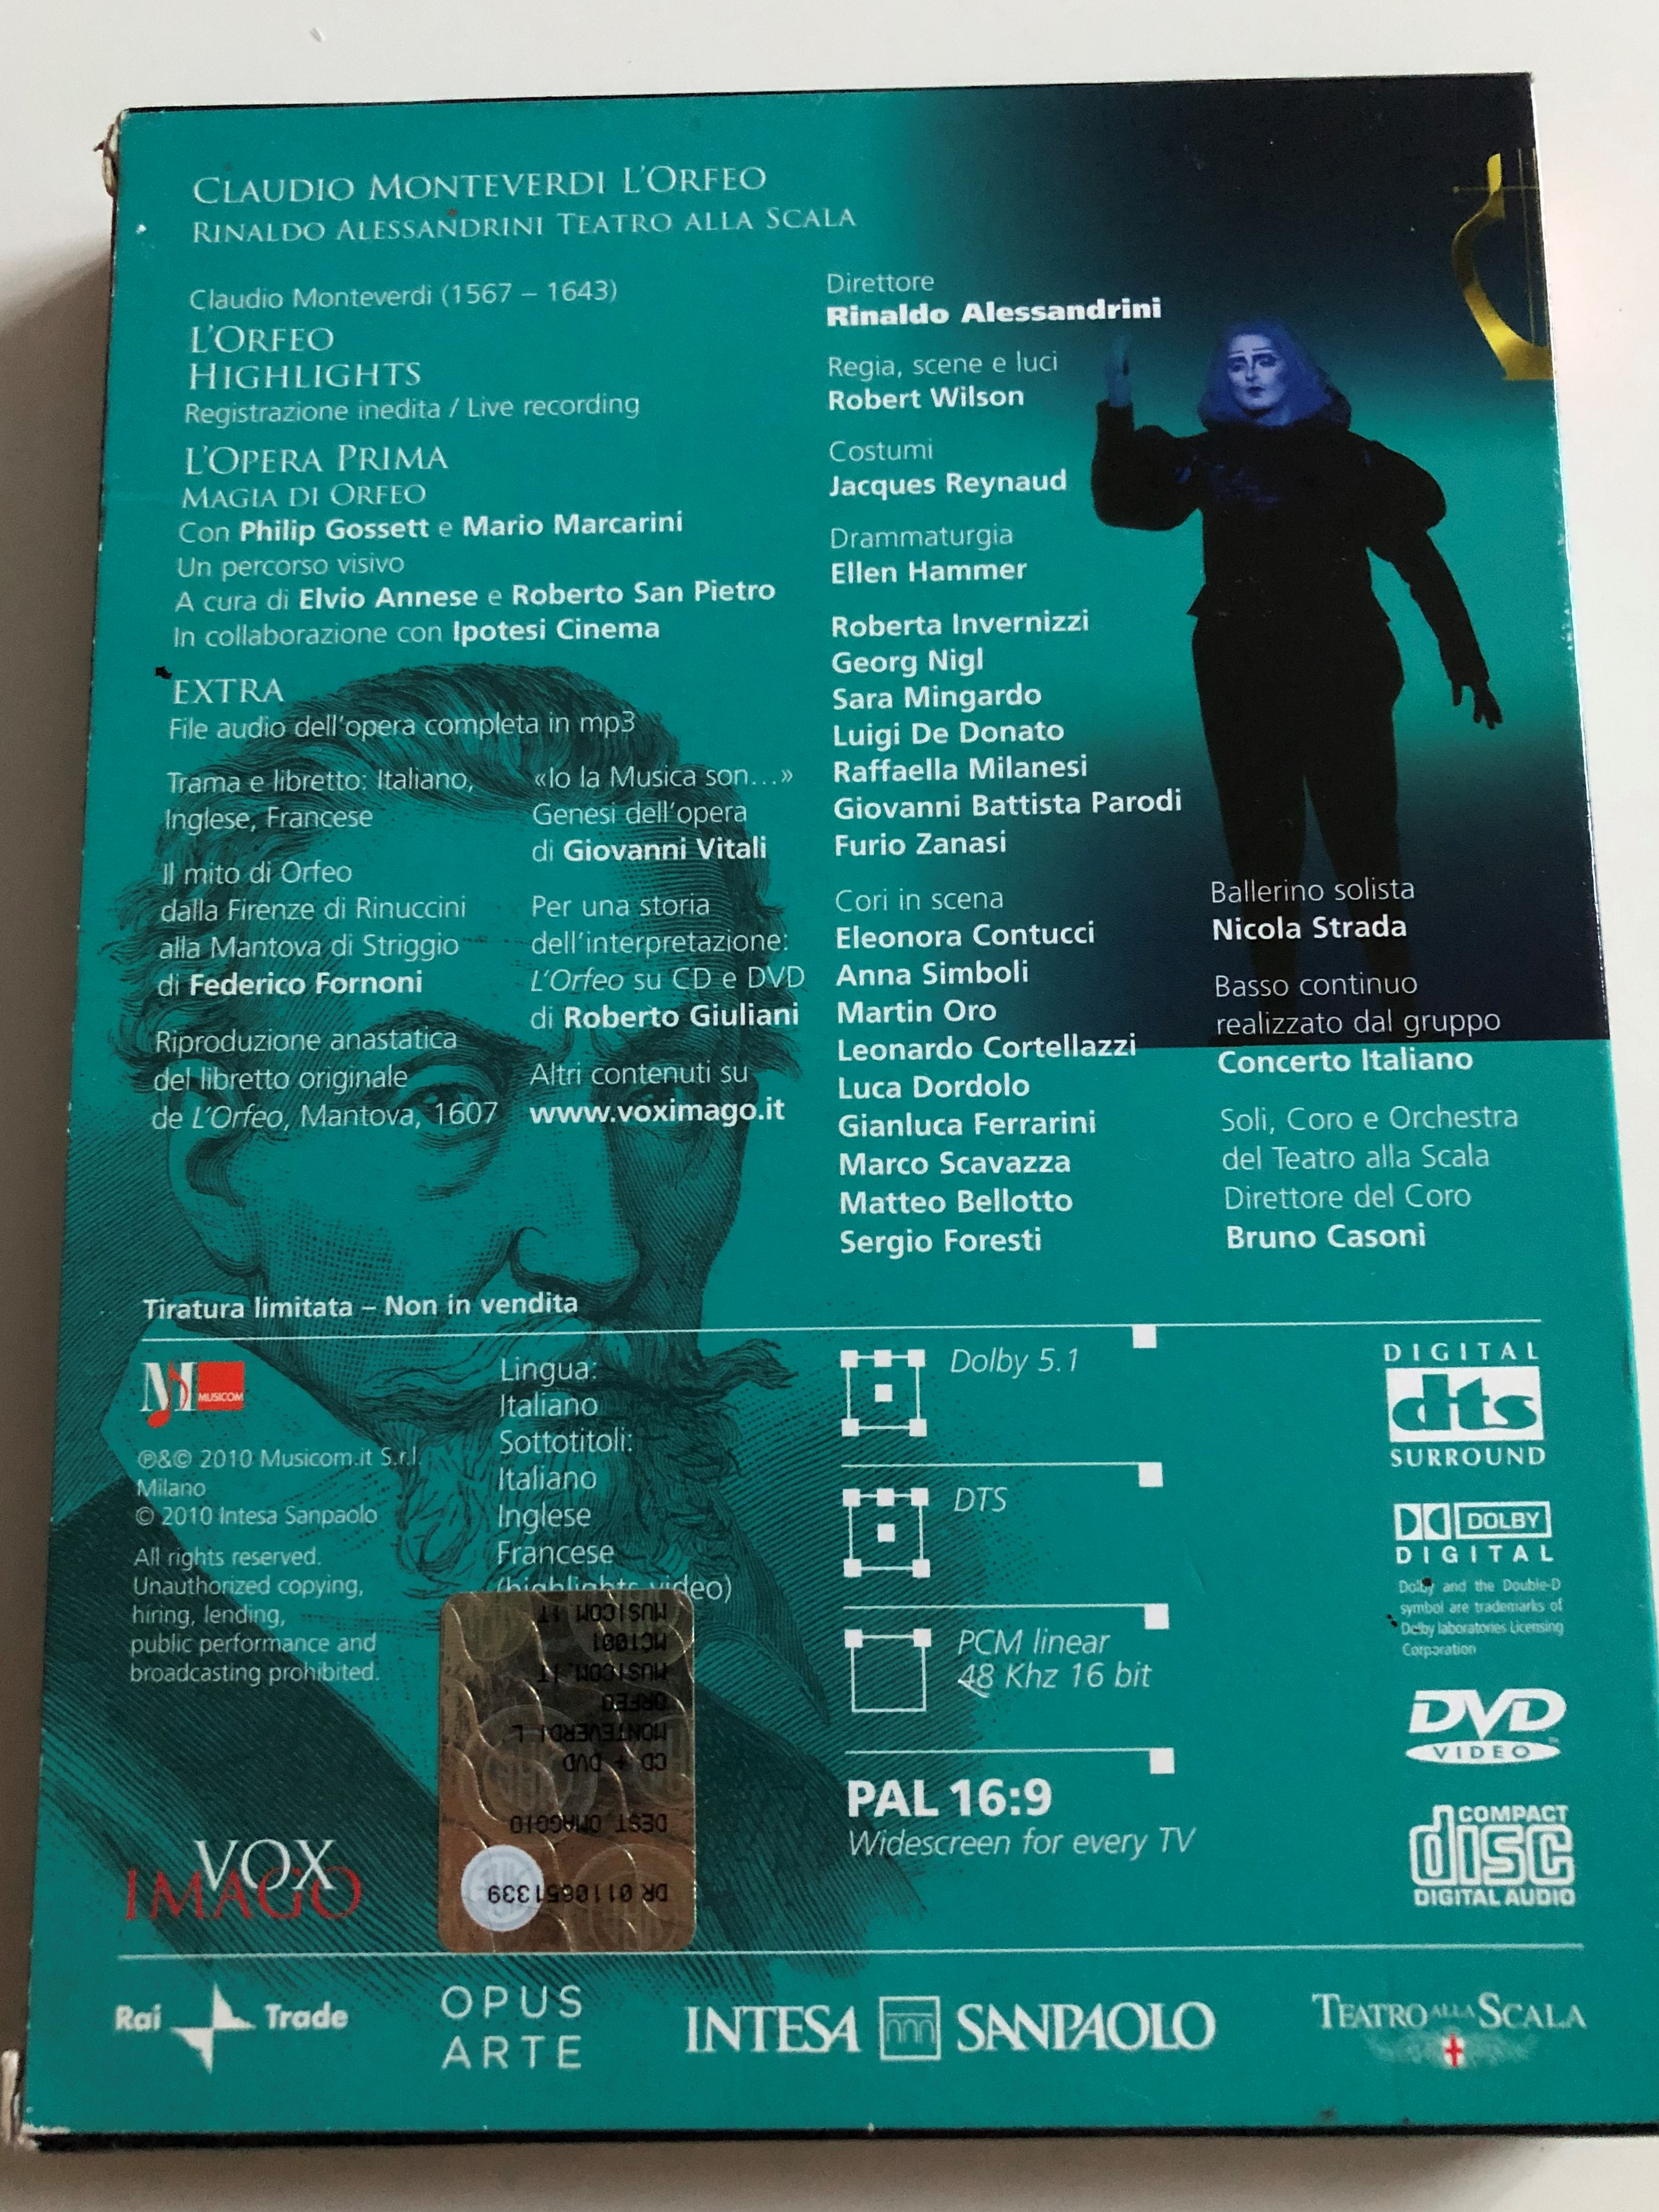 -claudio-monteverdi-l-orfeo-cd-dvd-2010-conducted-by-rinaldo-alessandrini-teatro-alla-scala-directed-by-robert-wilson-10-.jpg